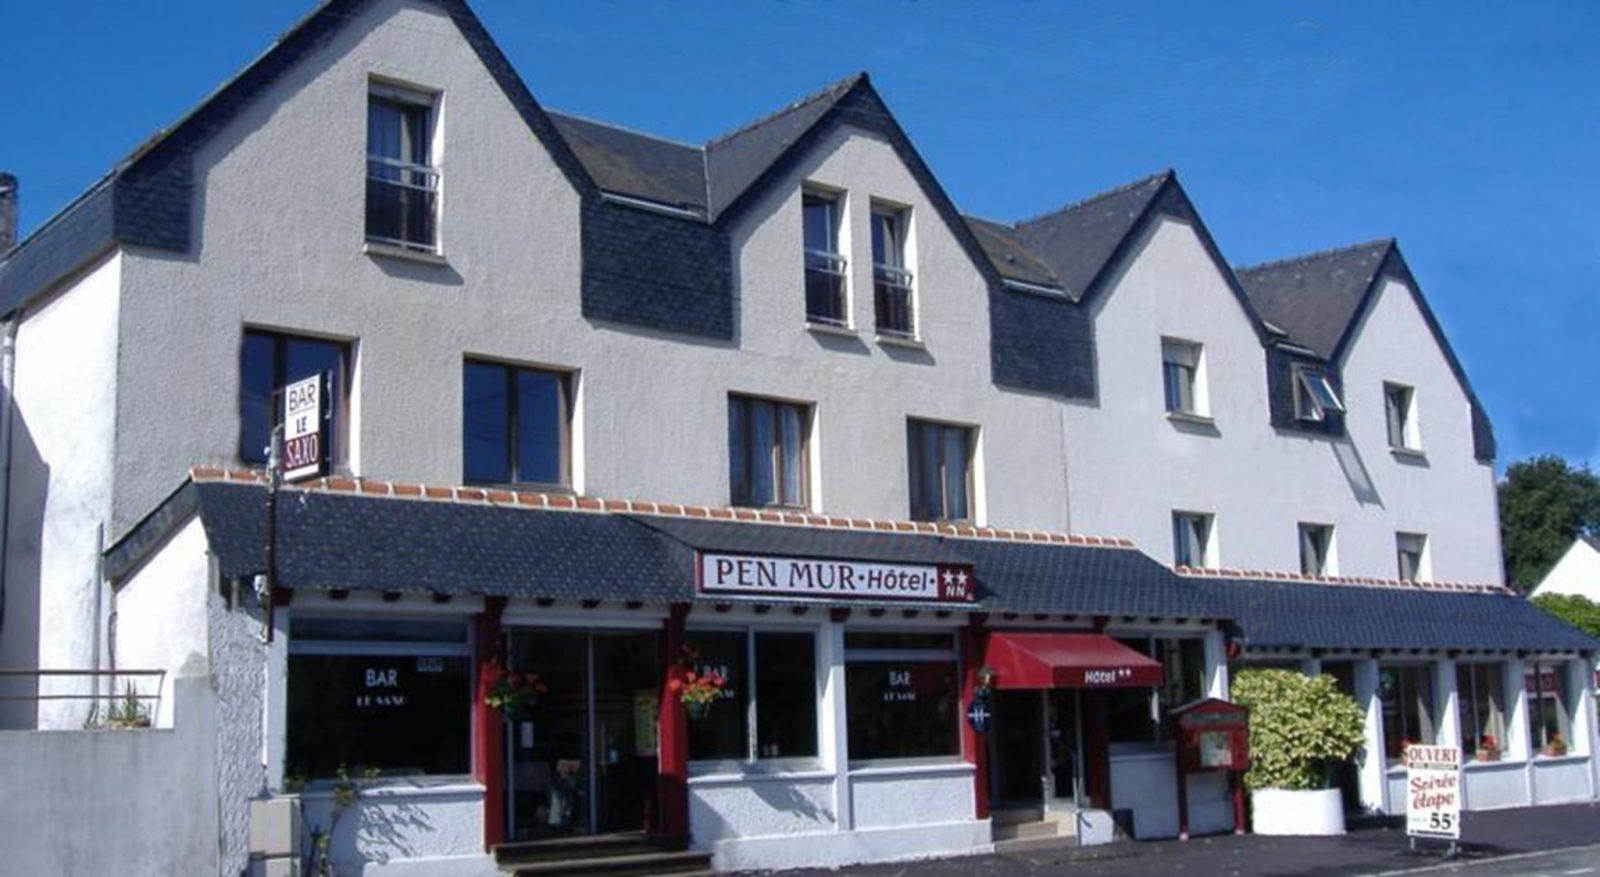 Hôtel Auberge de Pen Mur Muzillac Morbihan